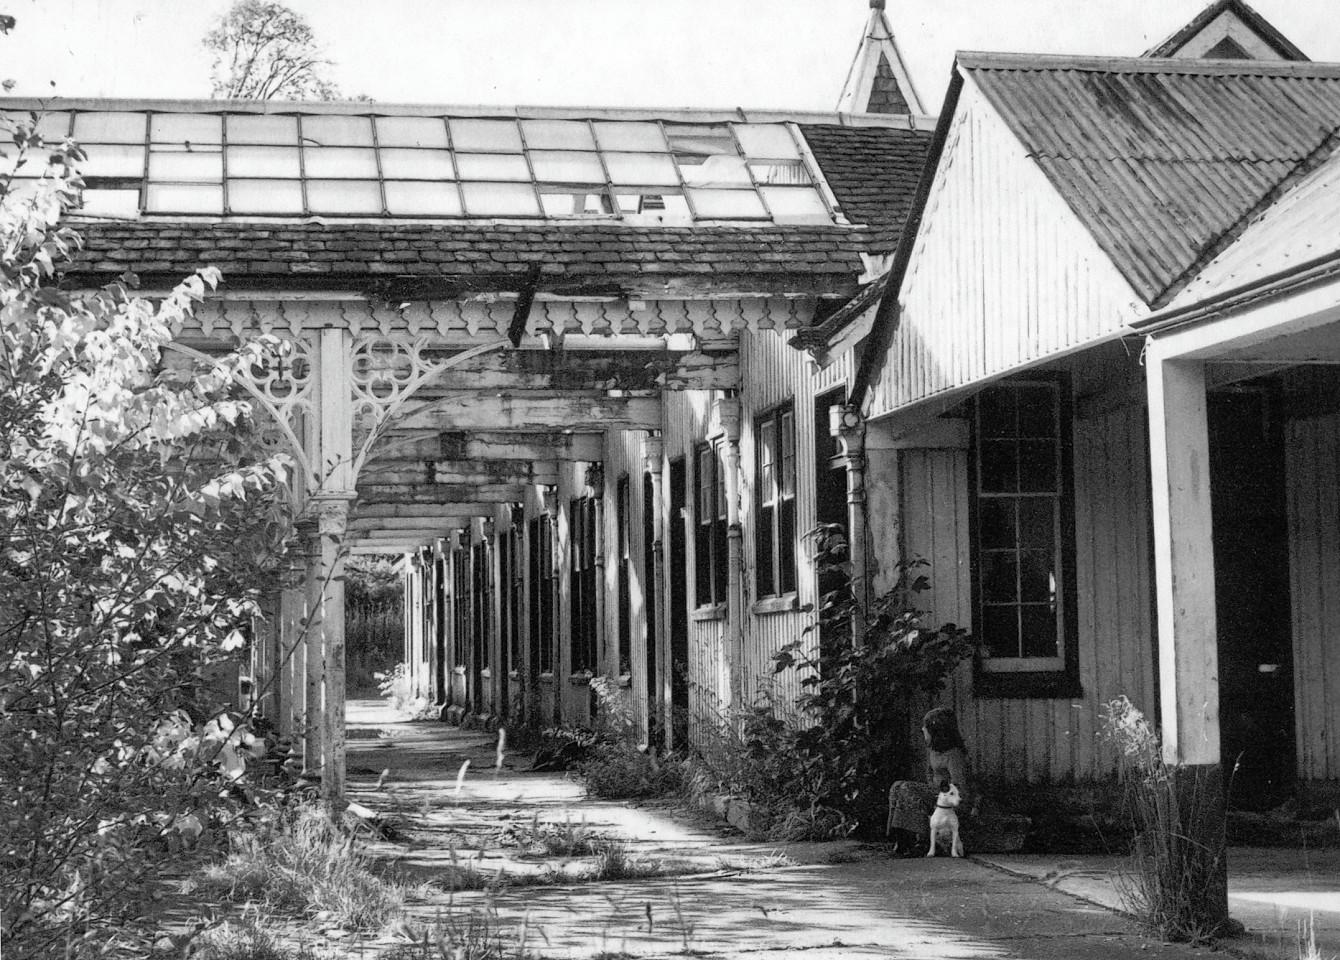 The old Strathpeffer train station